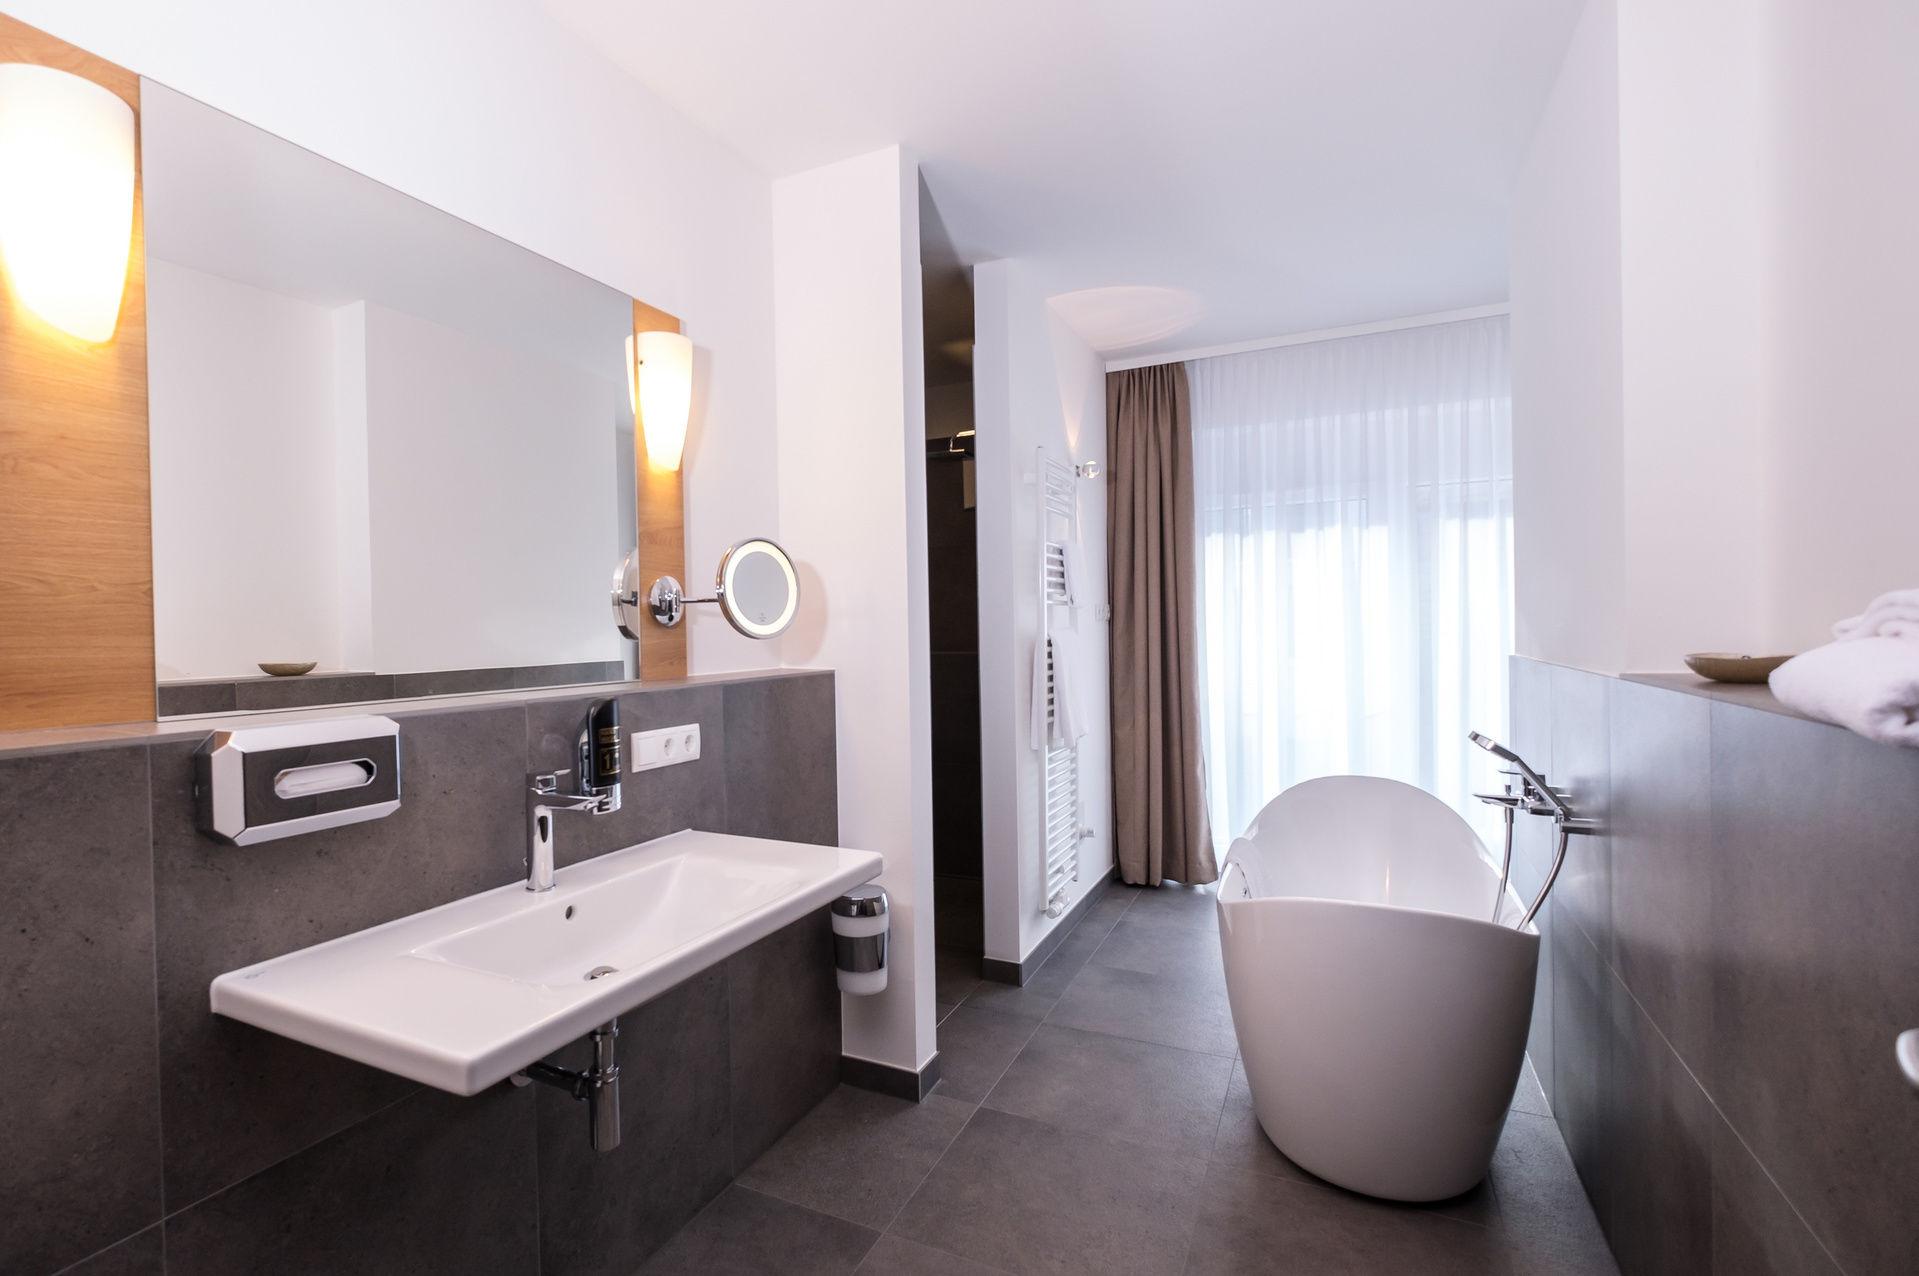 Appartementhotel rivers in Passau - Hotel Passau - Urlaub Passau